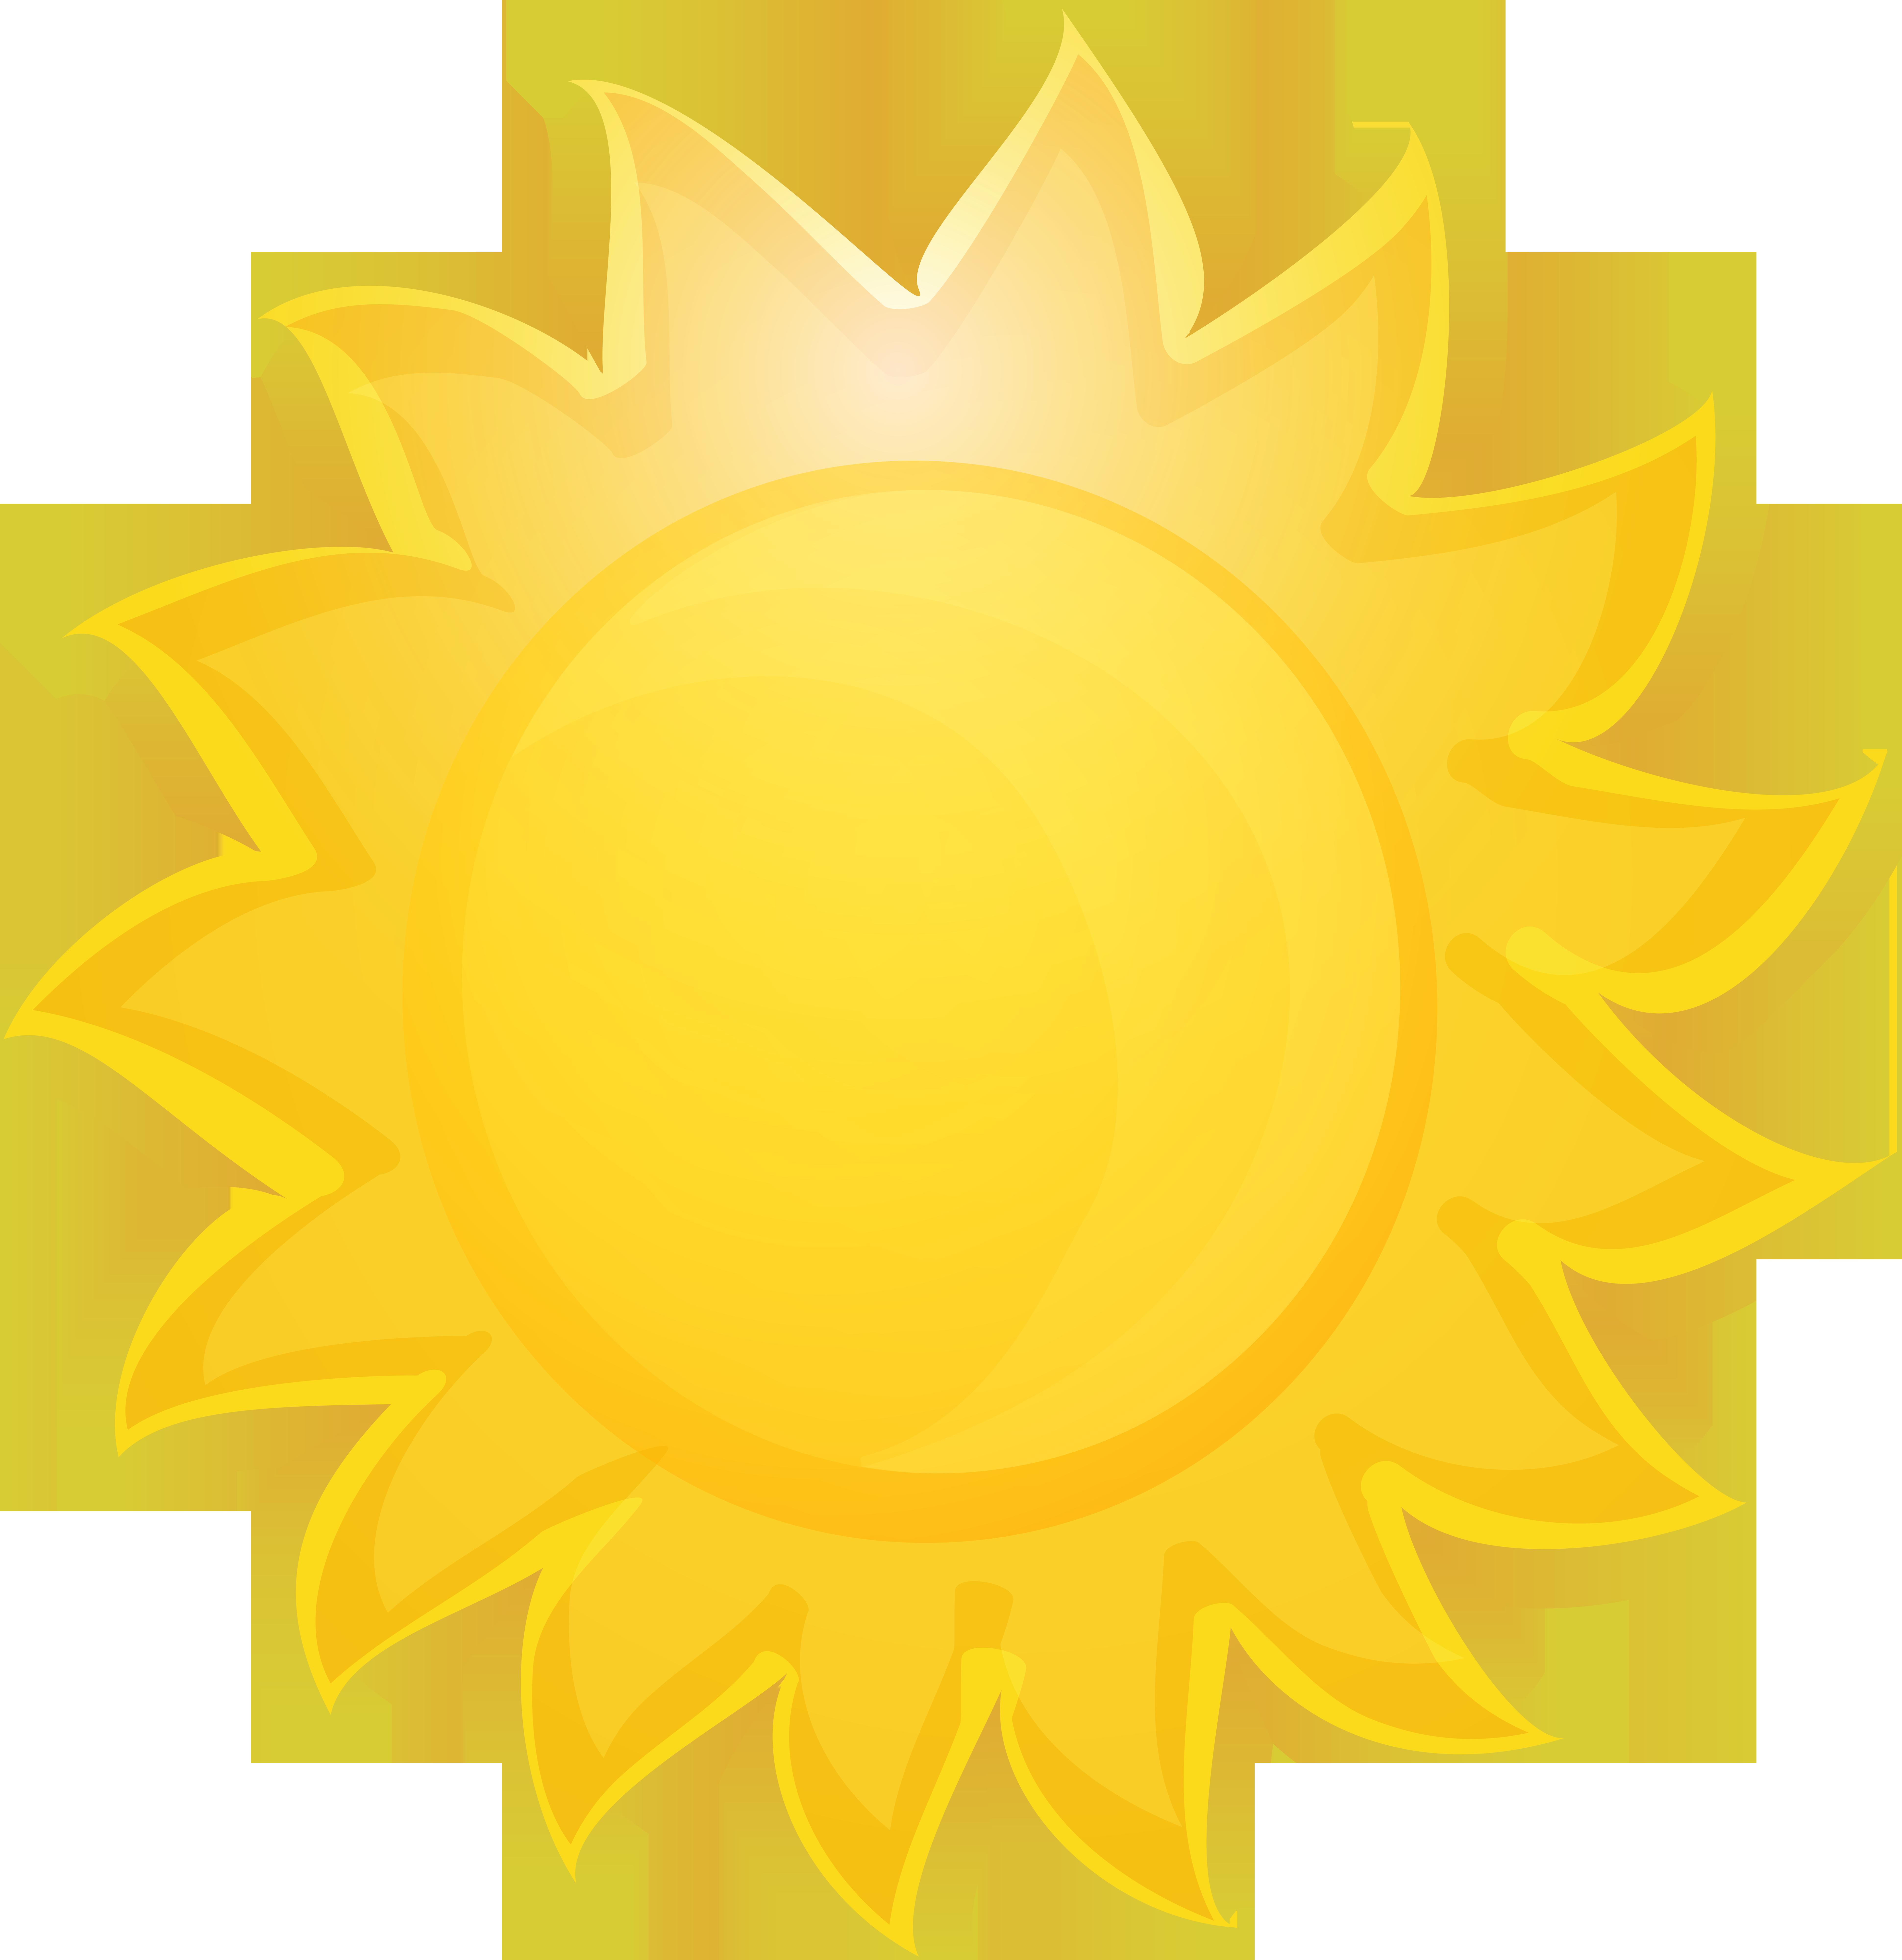 Png clip art image. Clipart sun yellow